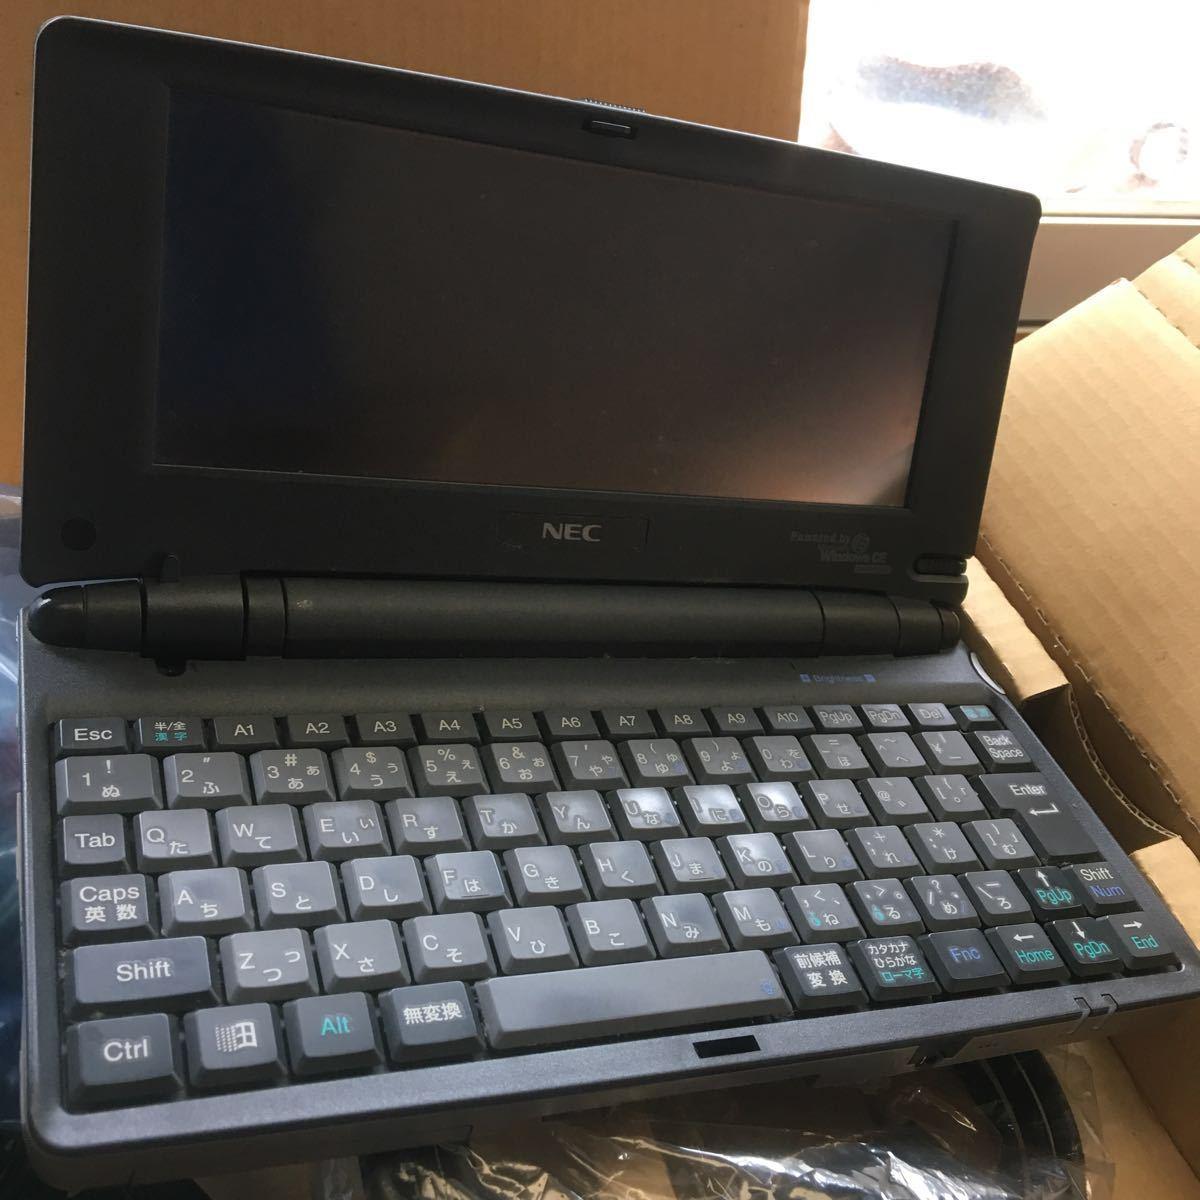 NEC Mobile gear II MC-R520 一式 一部未開封 動作保証なし _画像7